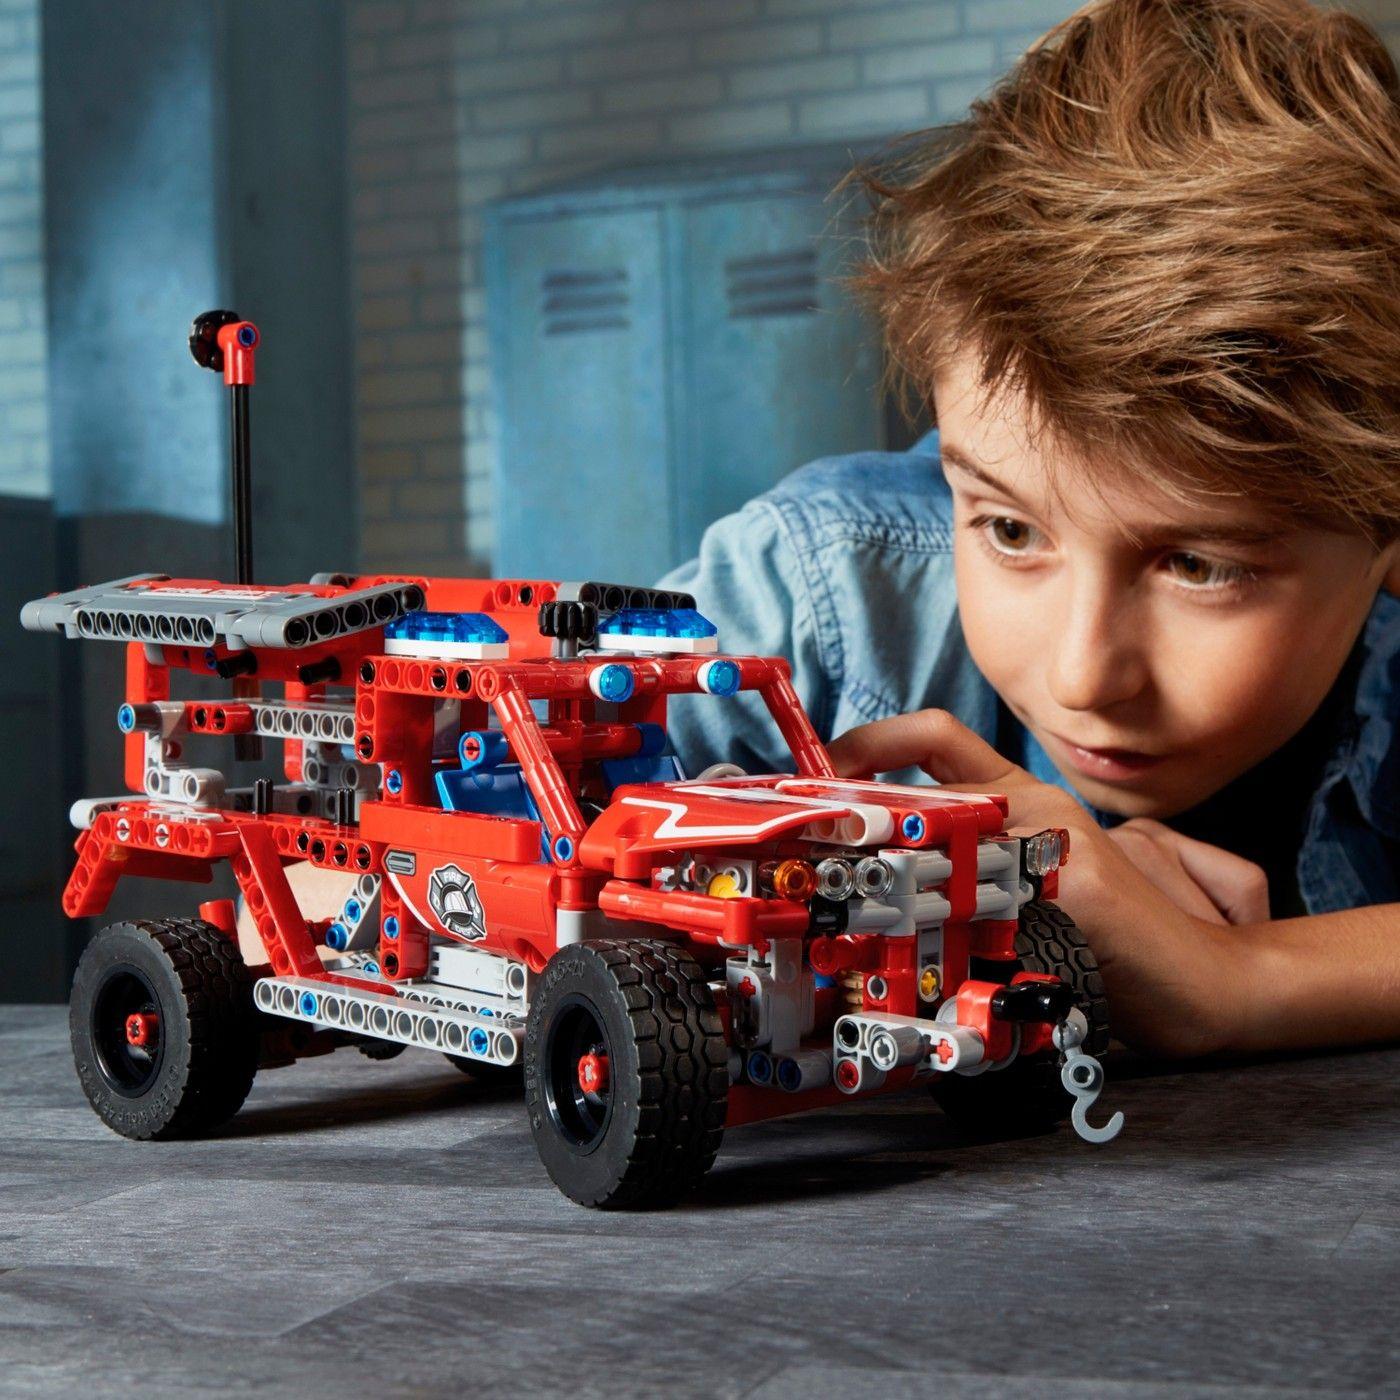 Lego Technic First Responder 42075 Technic Lego Responder Building Fans Lego Technic Lego Lego For Kids